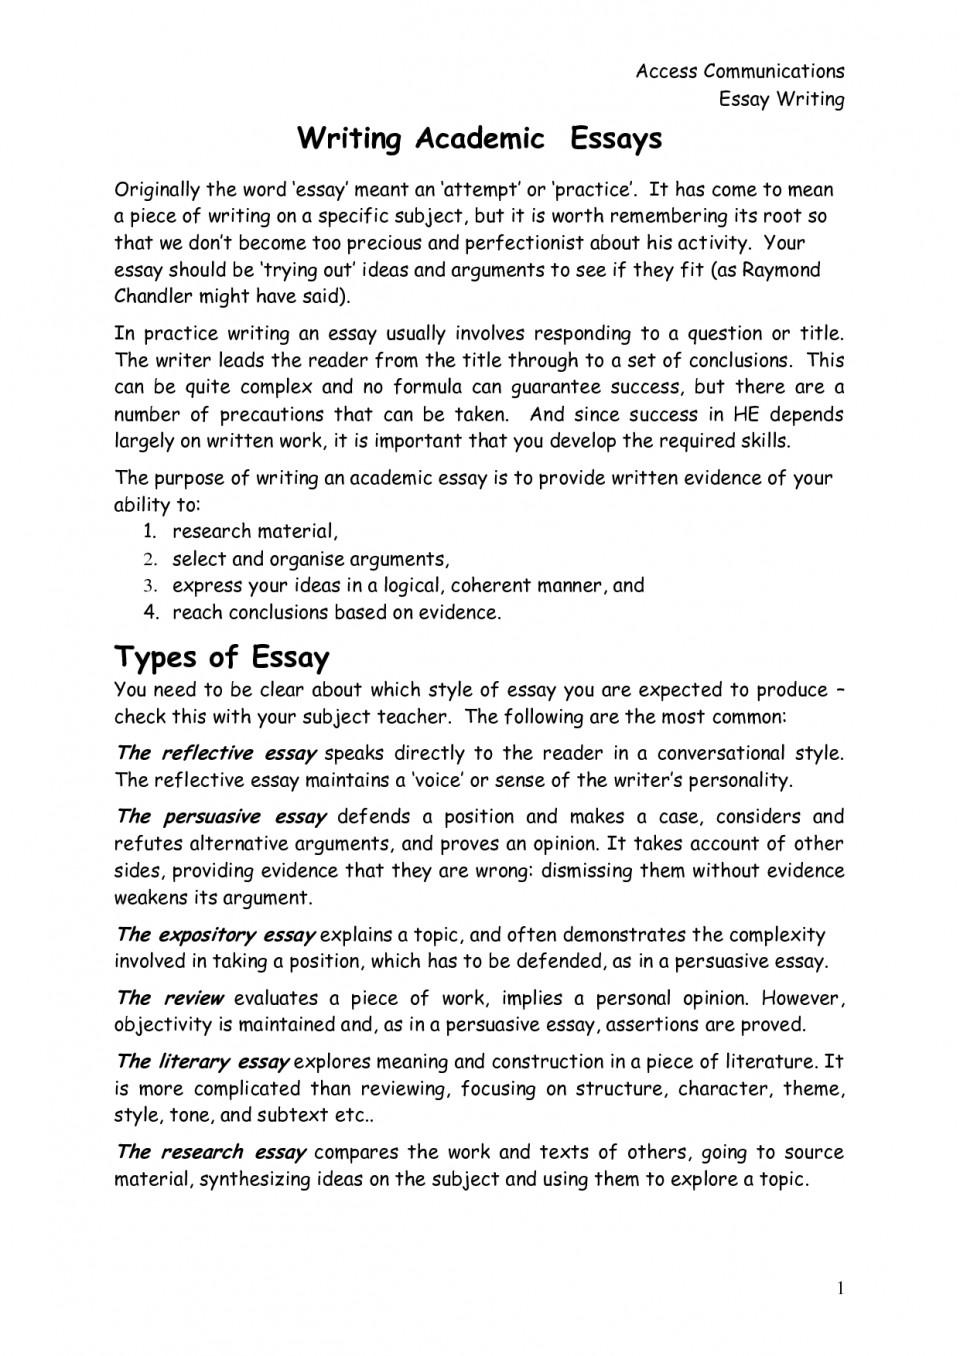 009 Reflective Essay Introduction Example Unbelievable Academic Good 960